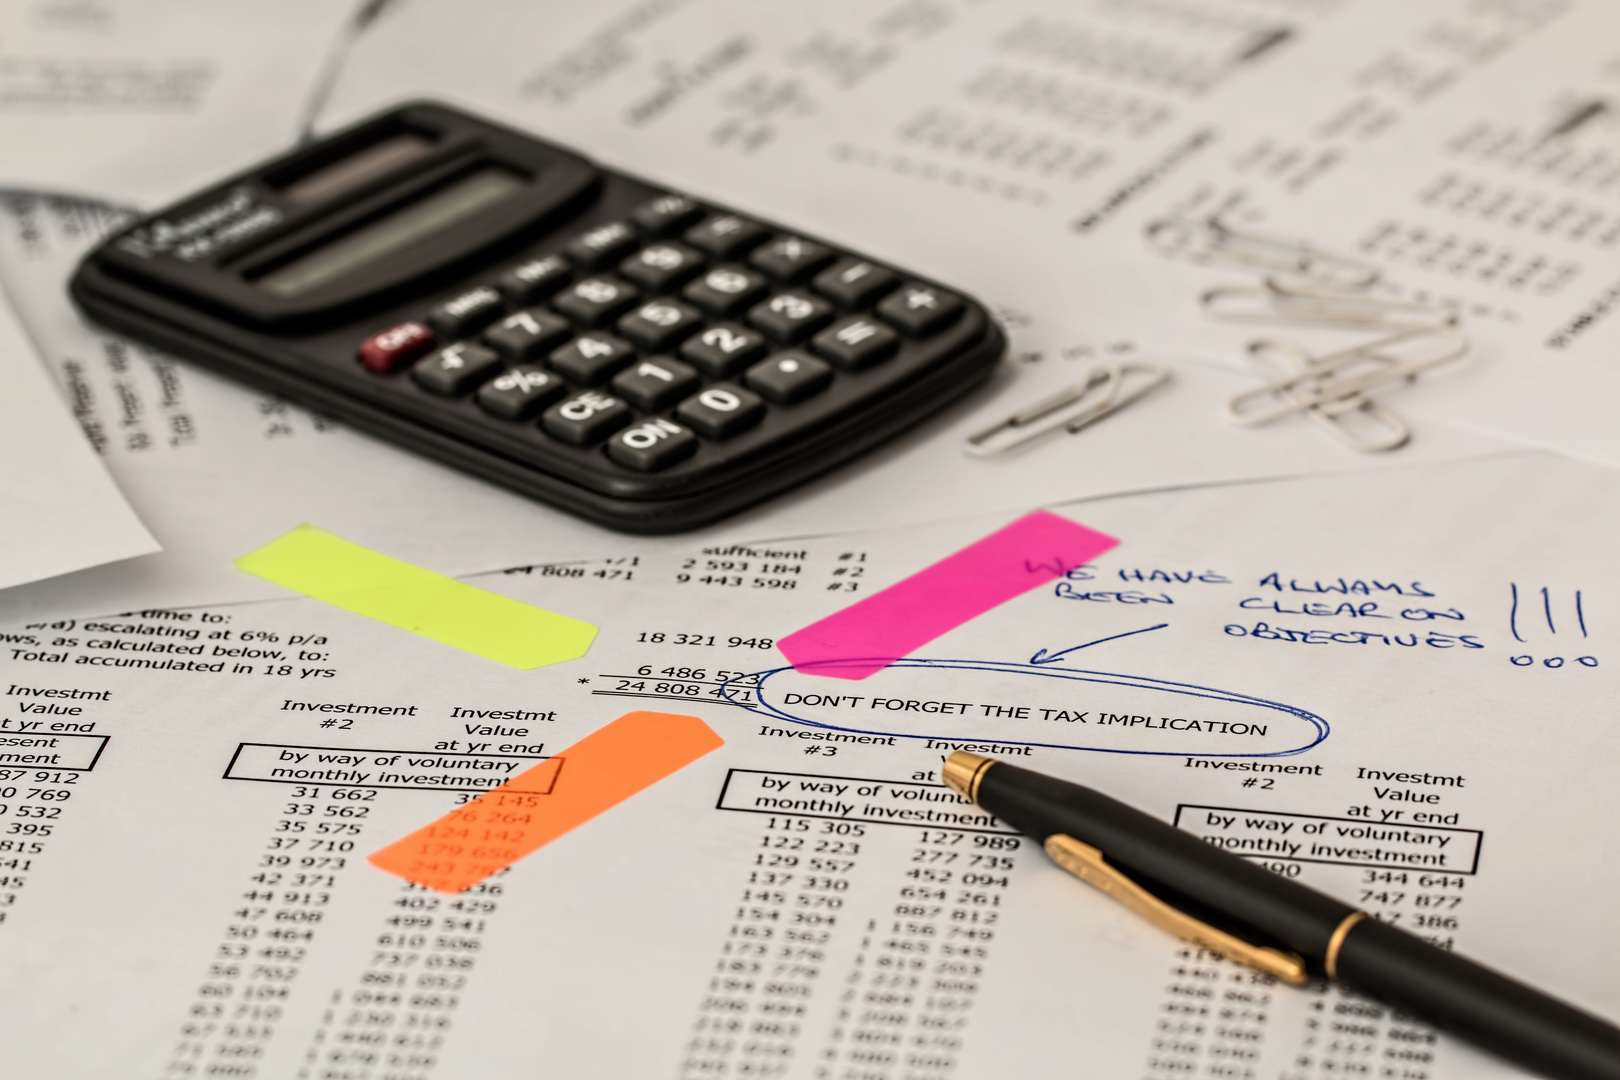 Tax Salvage Value